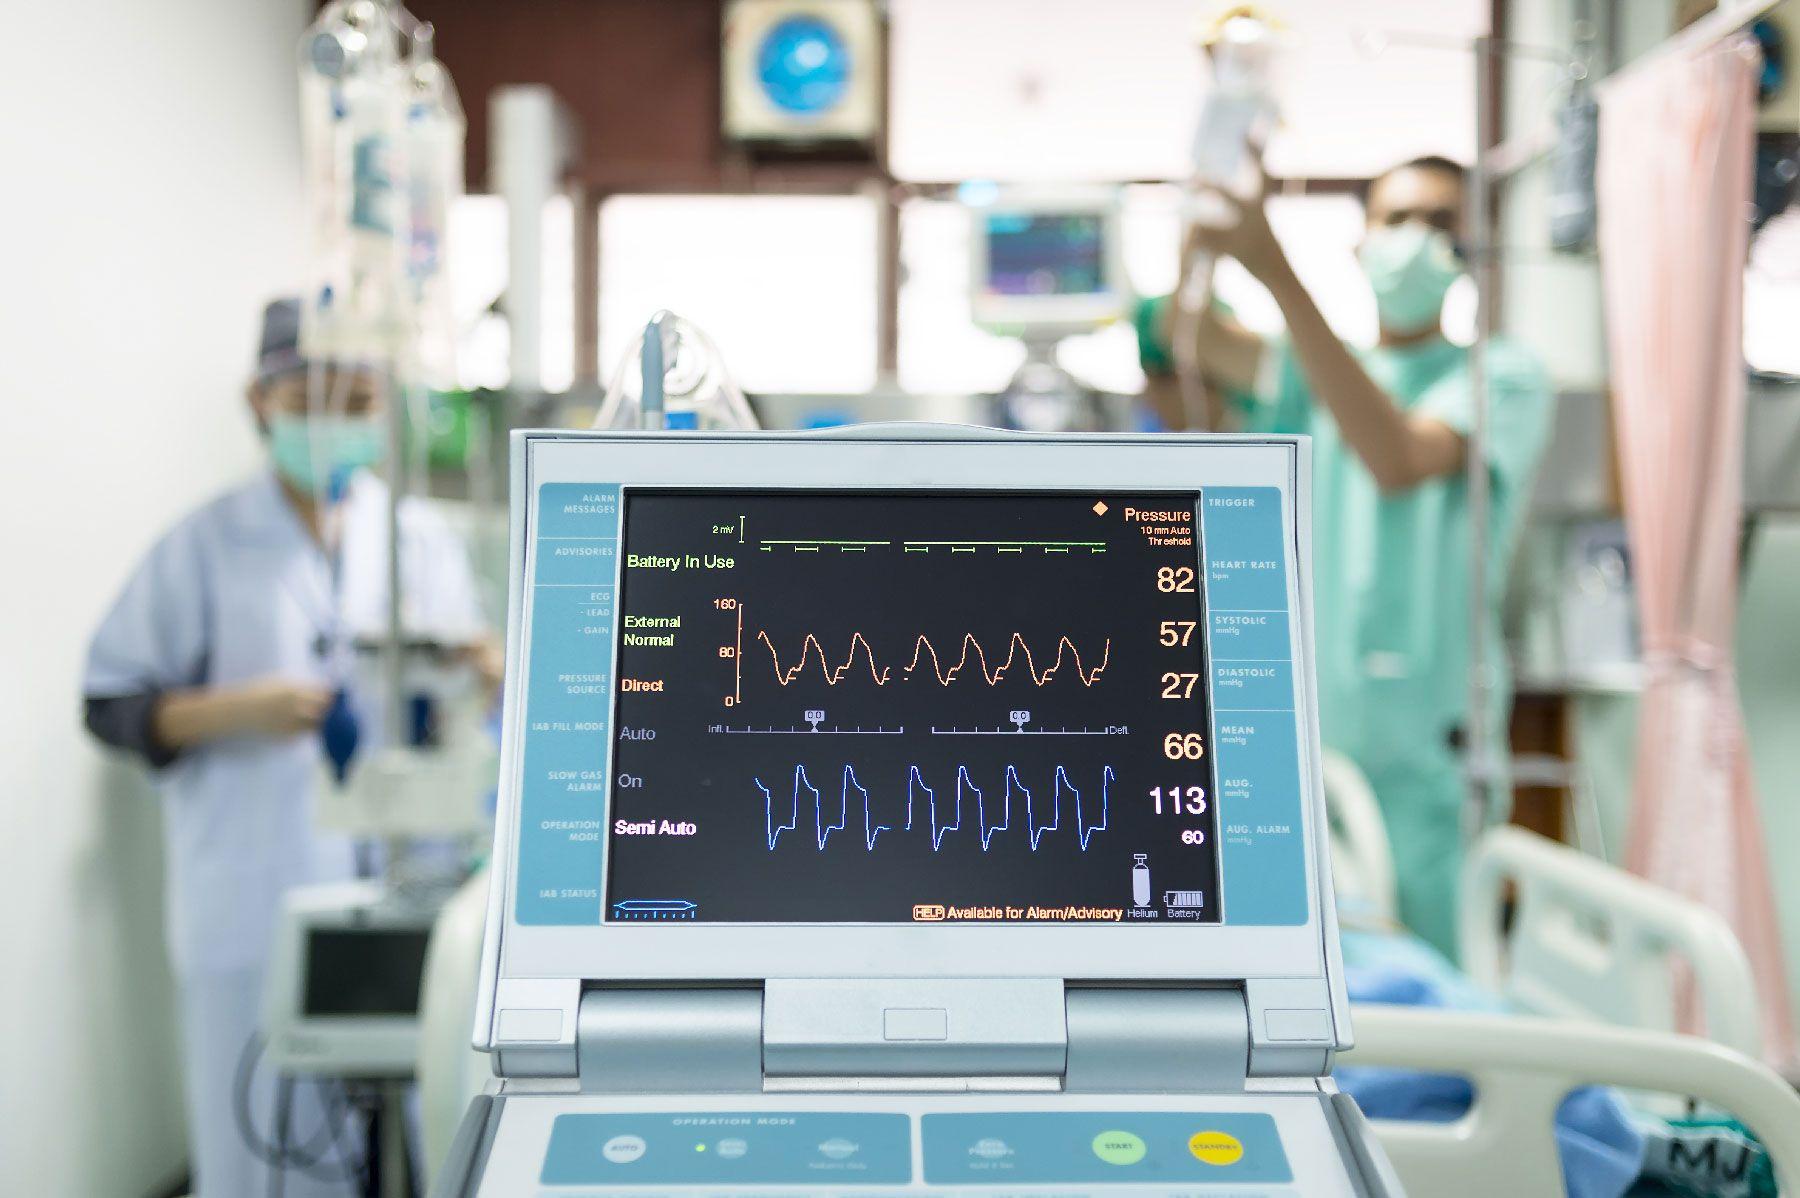 Critical Care Ultrasonography, a noninvasive method of